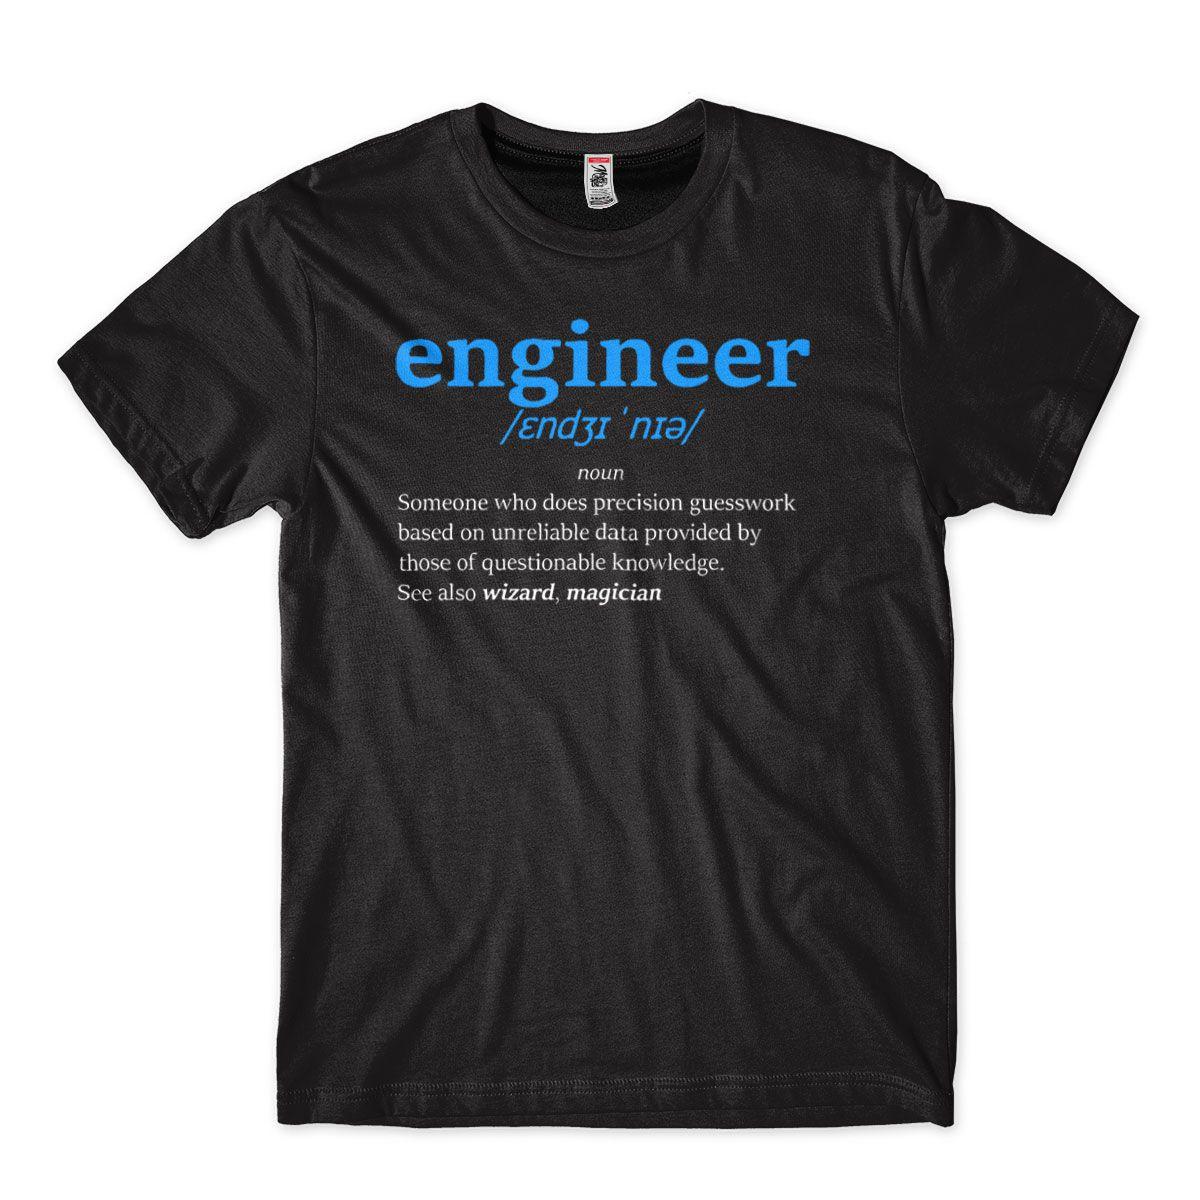 Camiseta Masculina Engenheiro Definicao Mago Magico Engineer